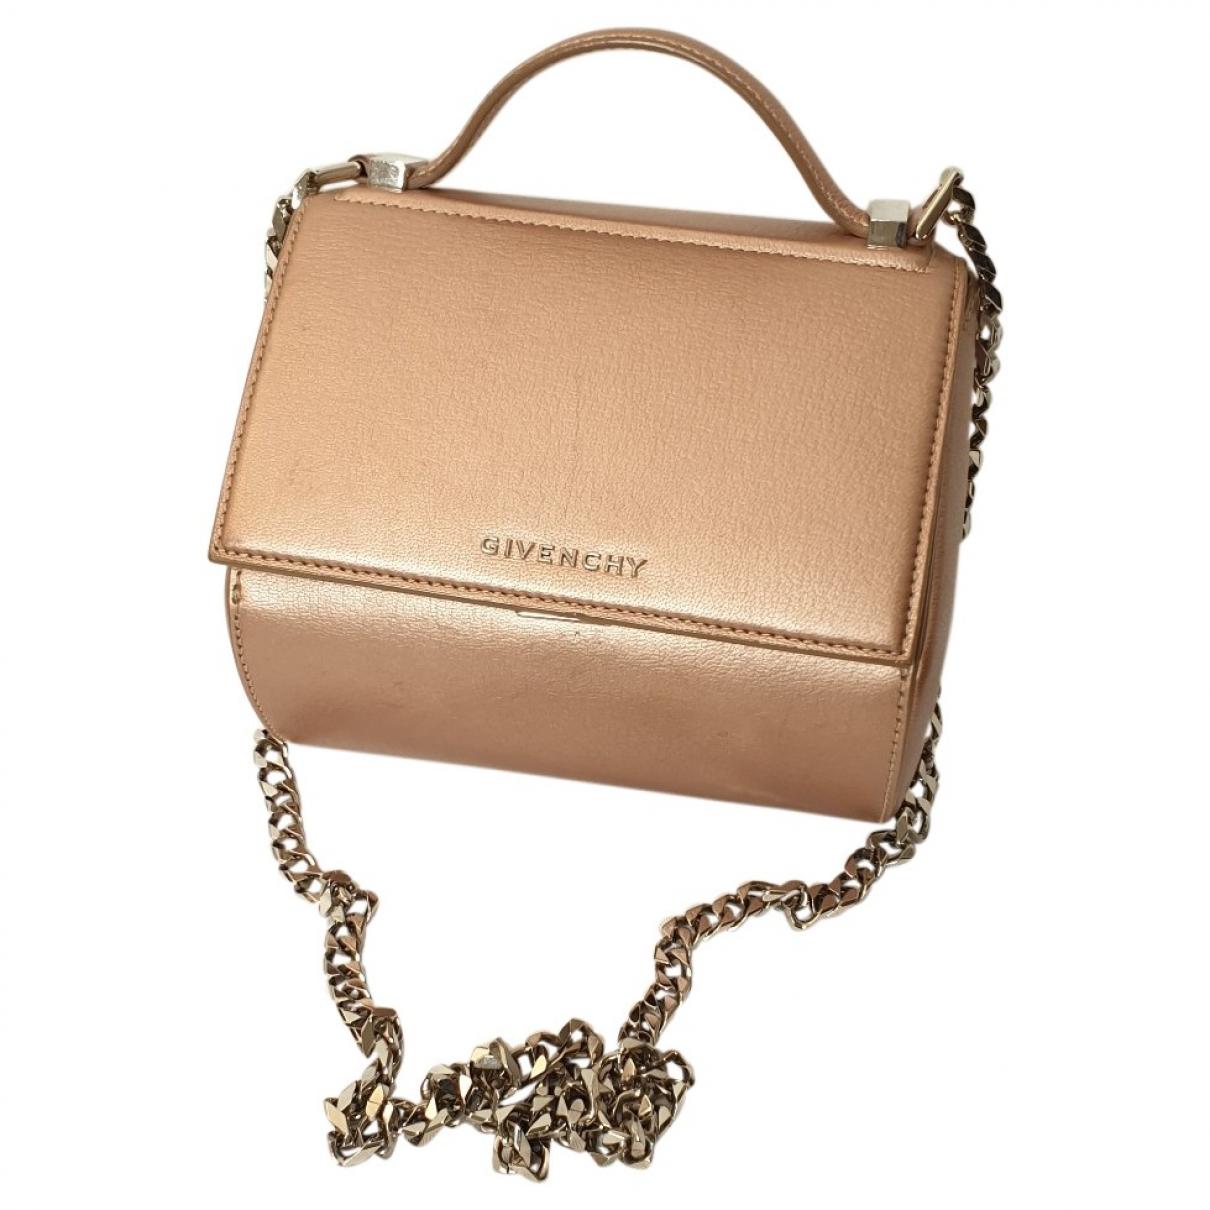 Givenchy Pandora Box Metallic Leather handbag for Women \N